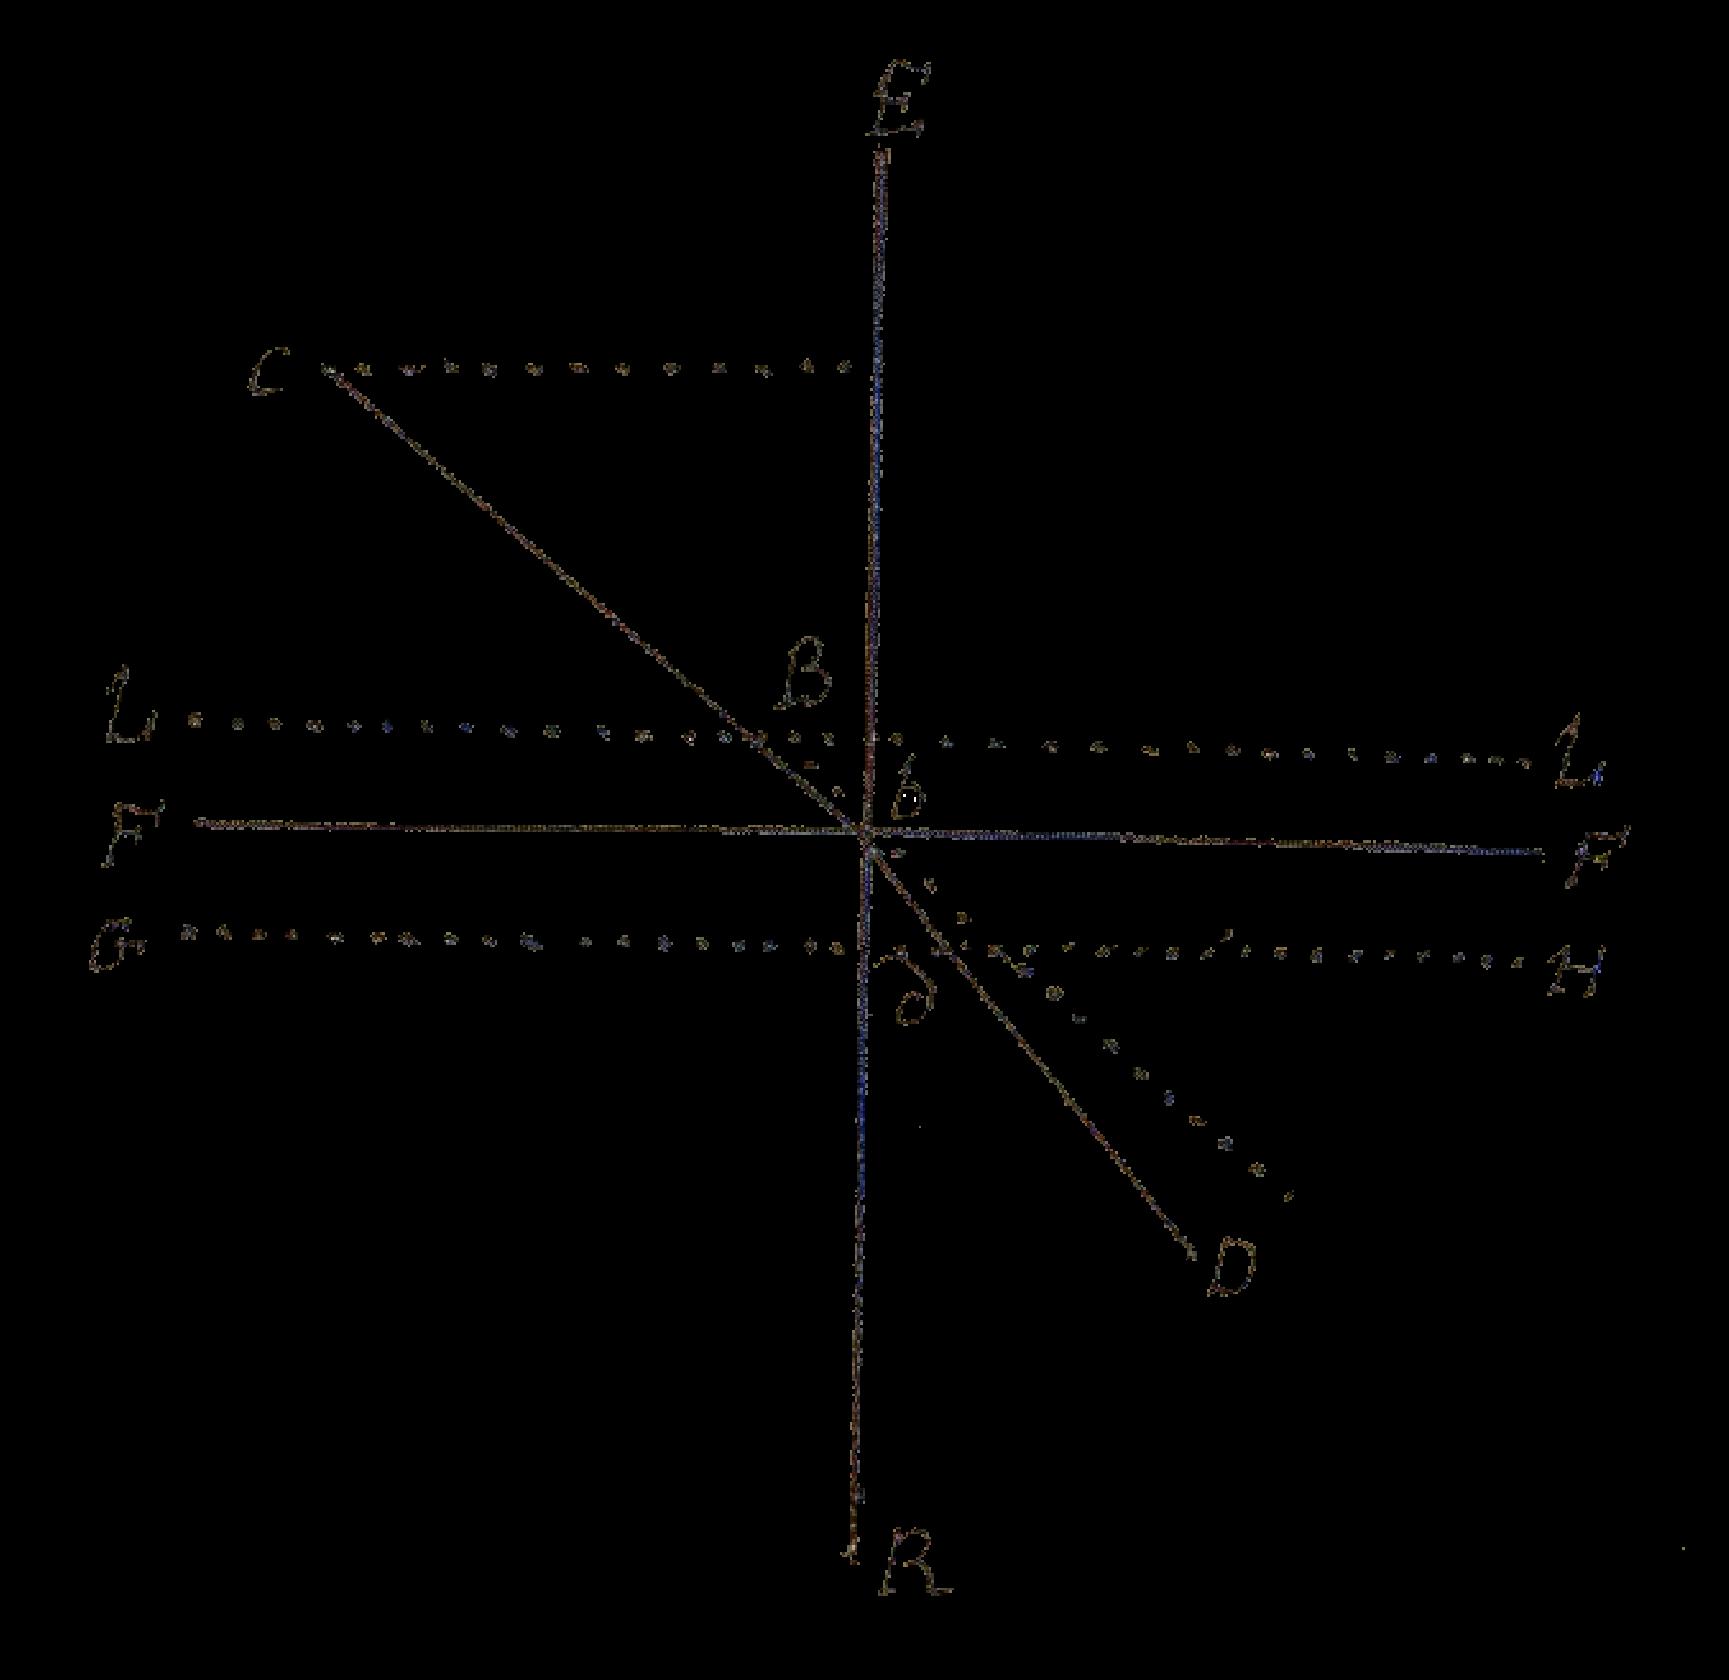 [Figure 1.]